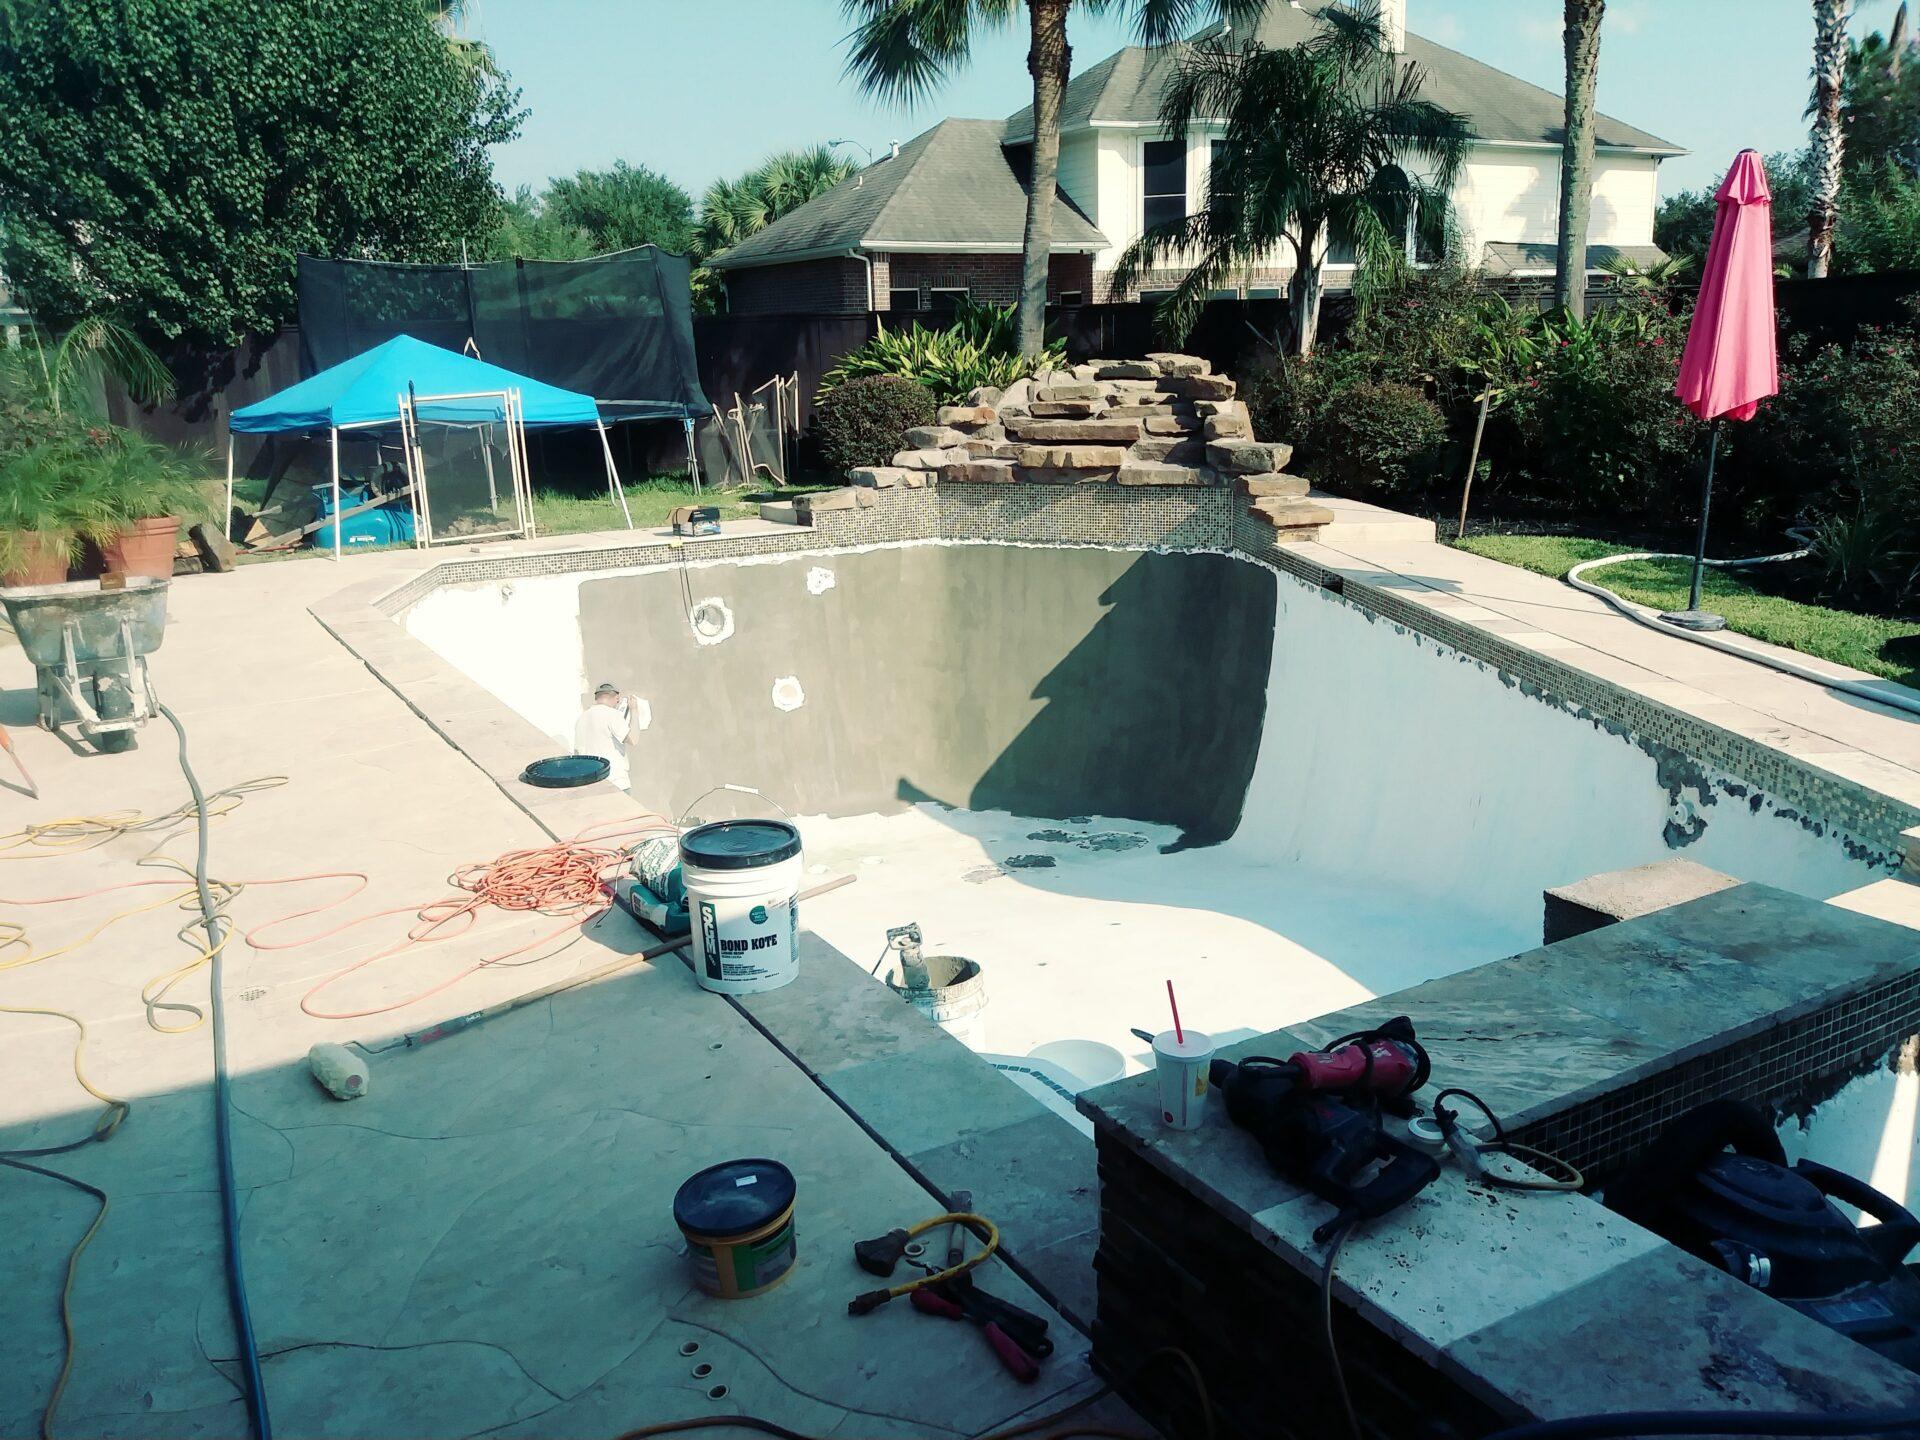 Pool Remodel - Katy - After Image002